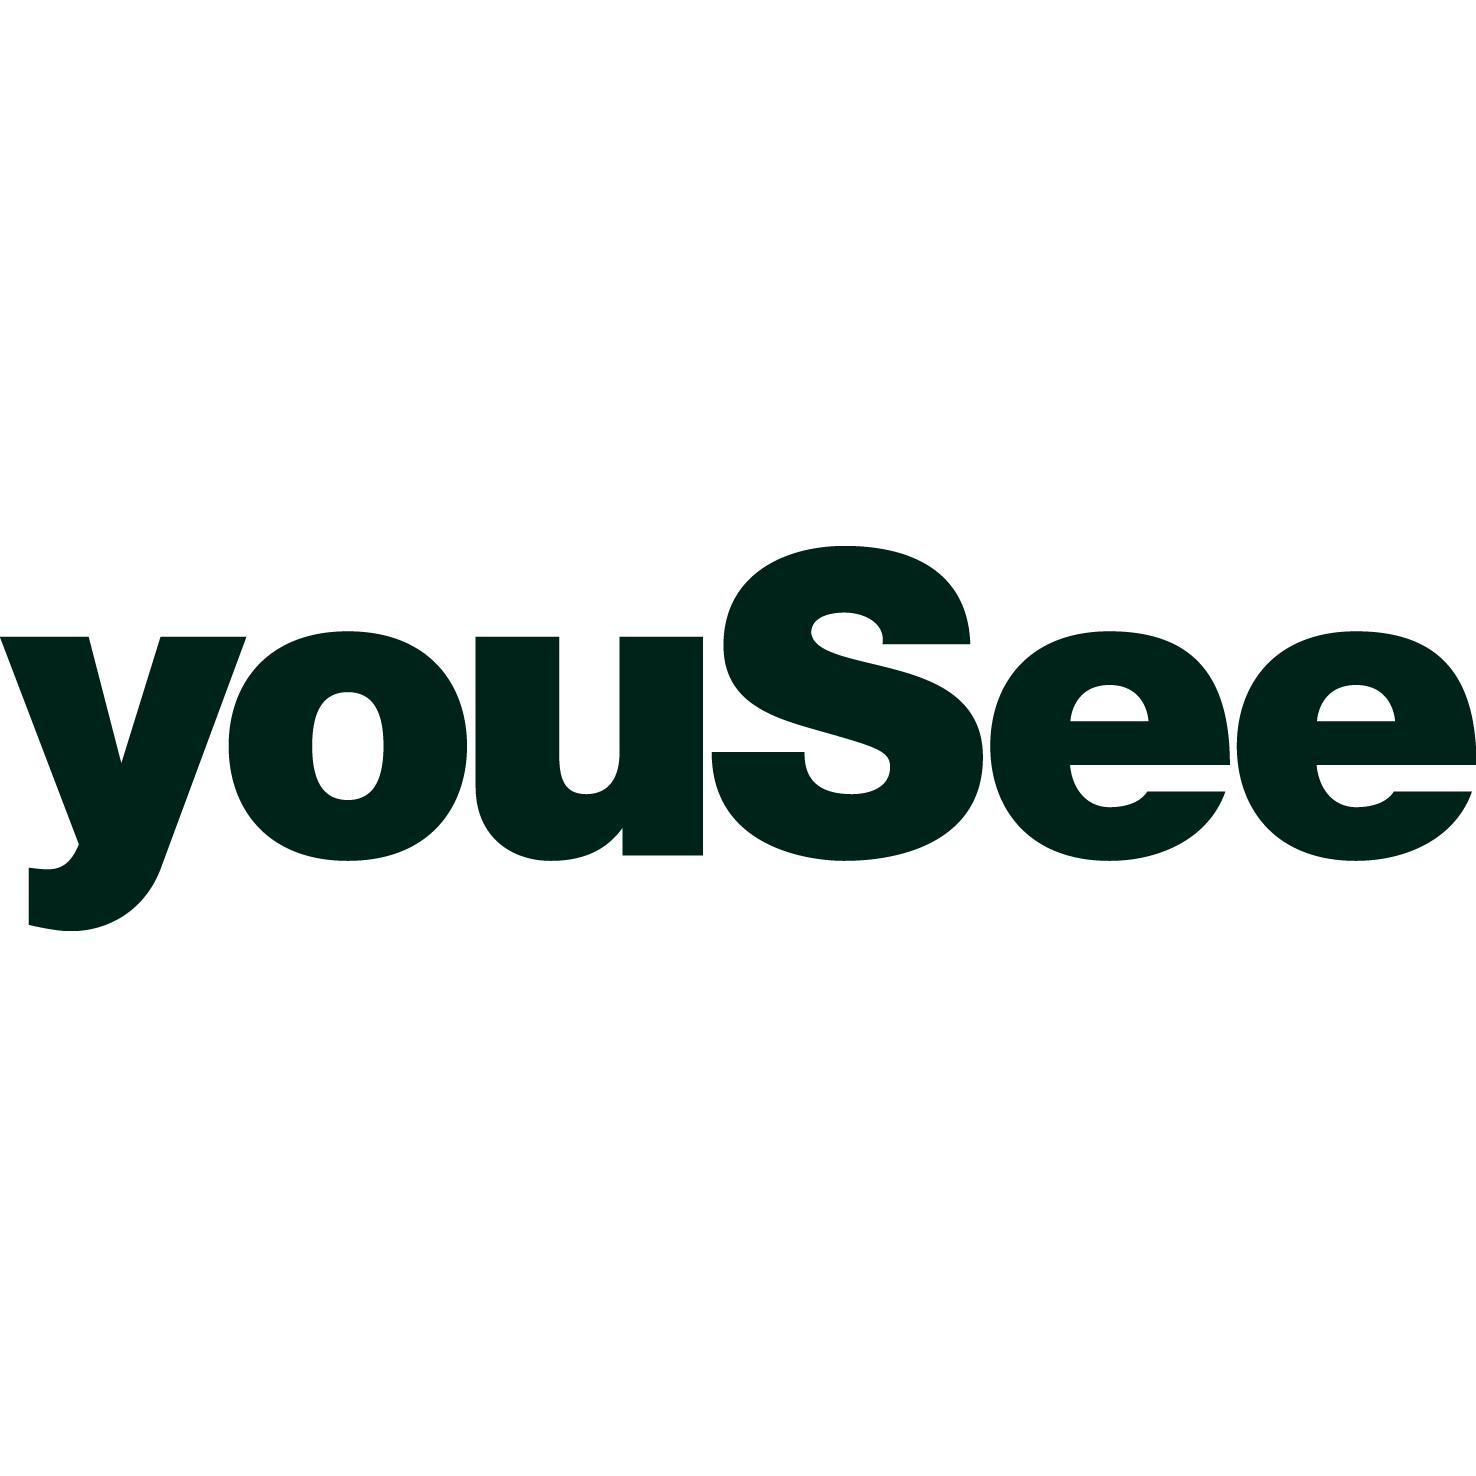 yousee logo 2015